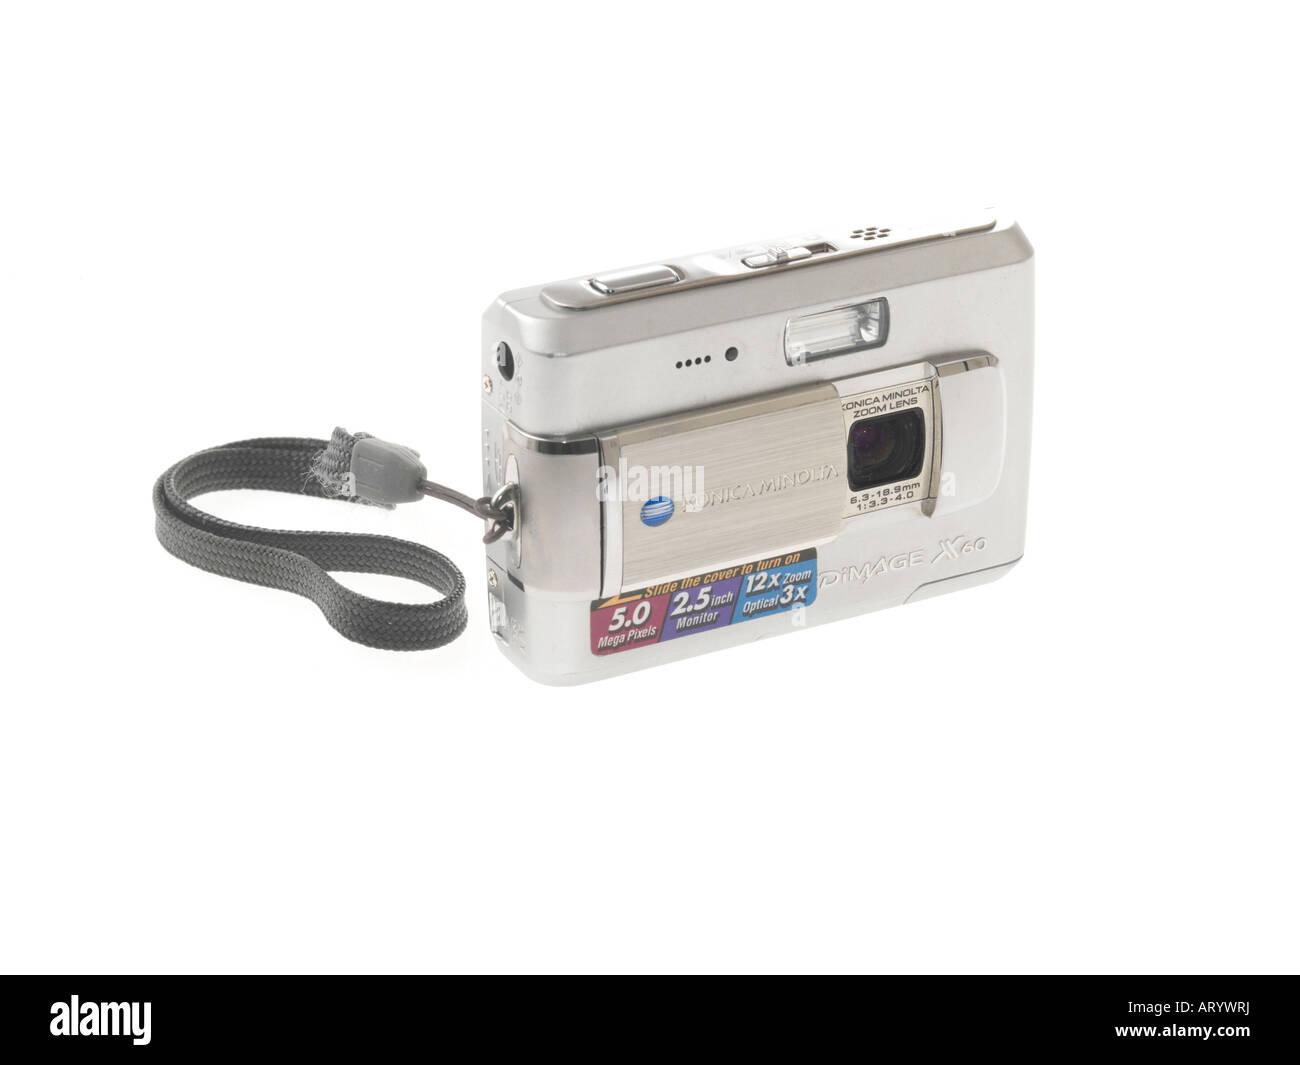 Compact Digital Camera - Stock Image